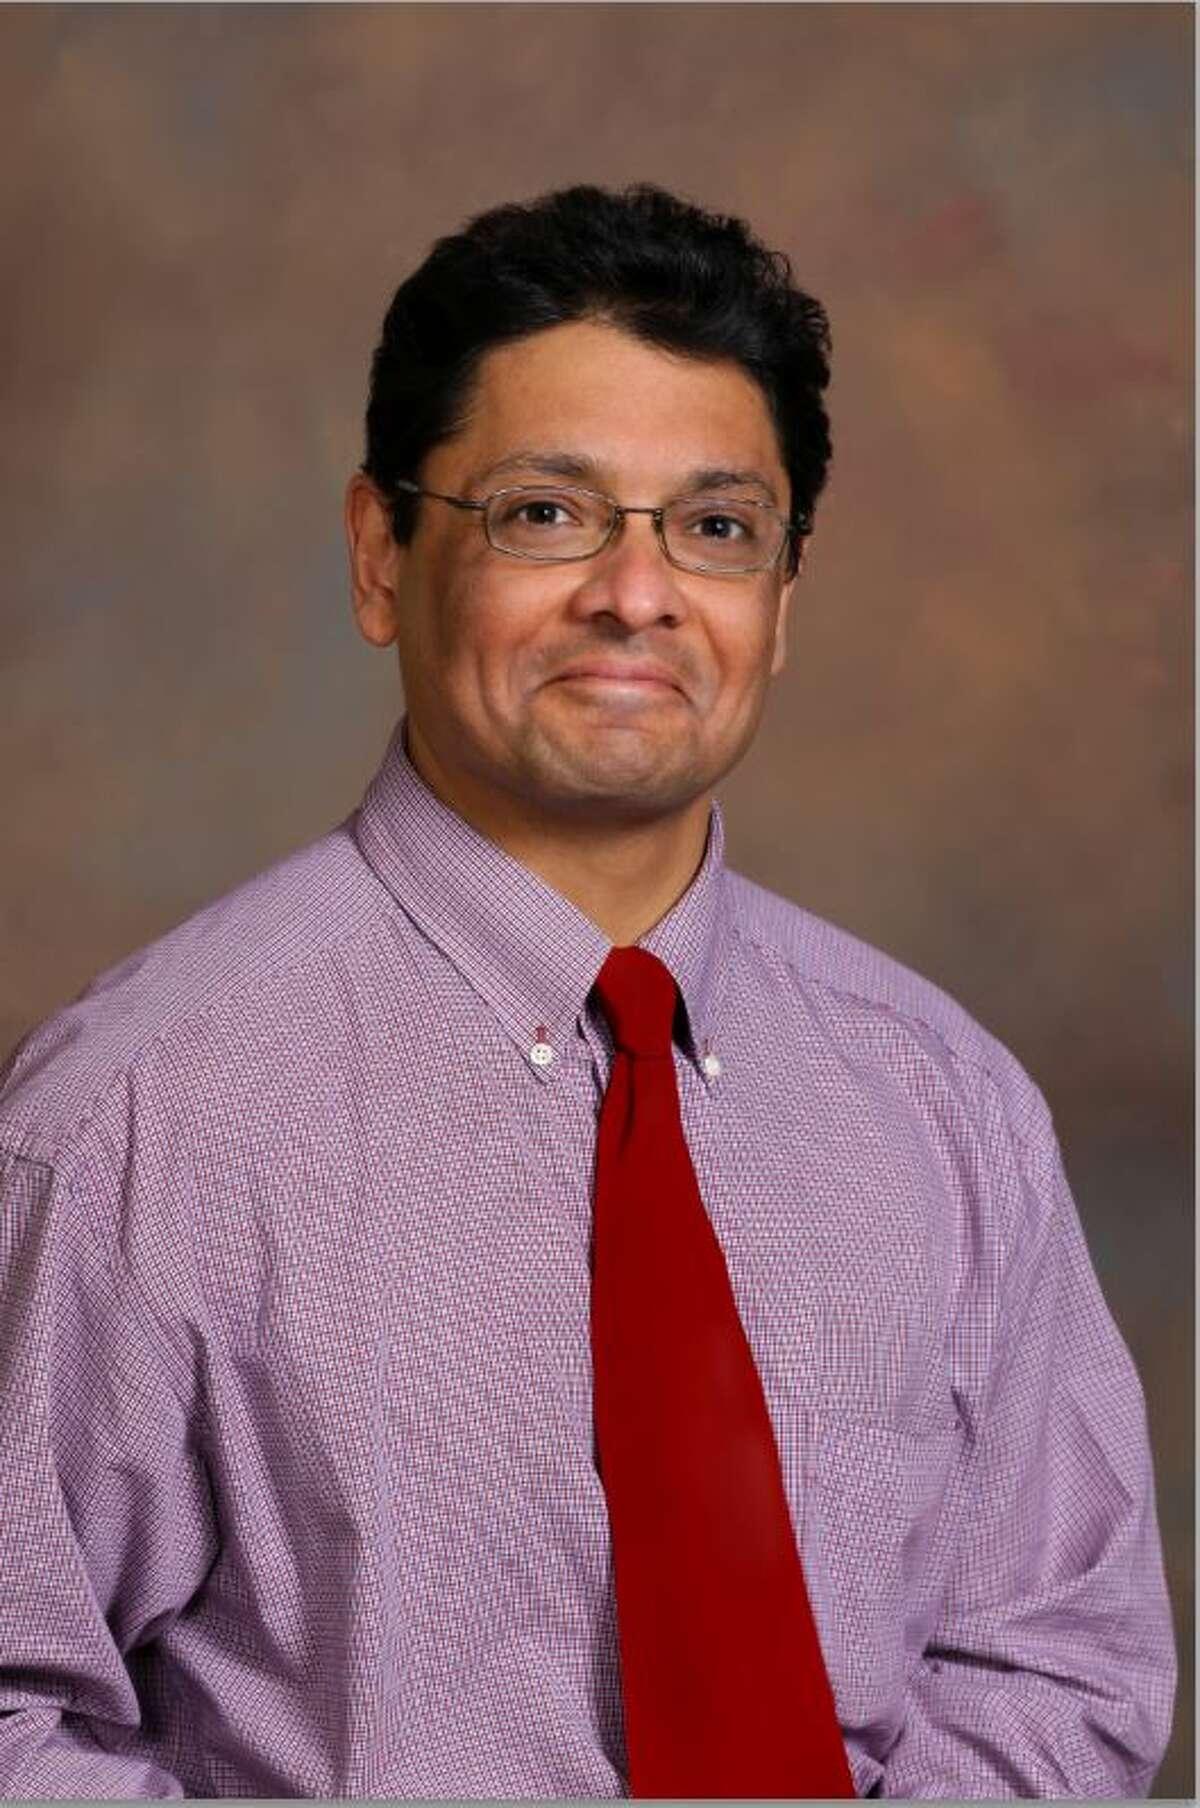 Dr. Bobby Jain Texas Tech University Health Sciences Center